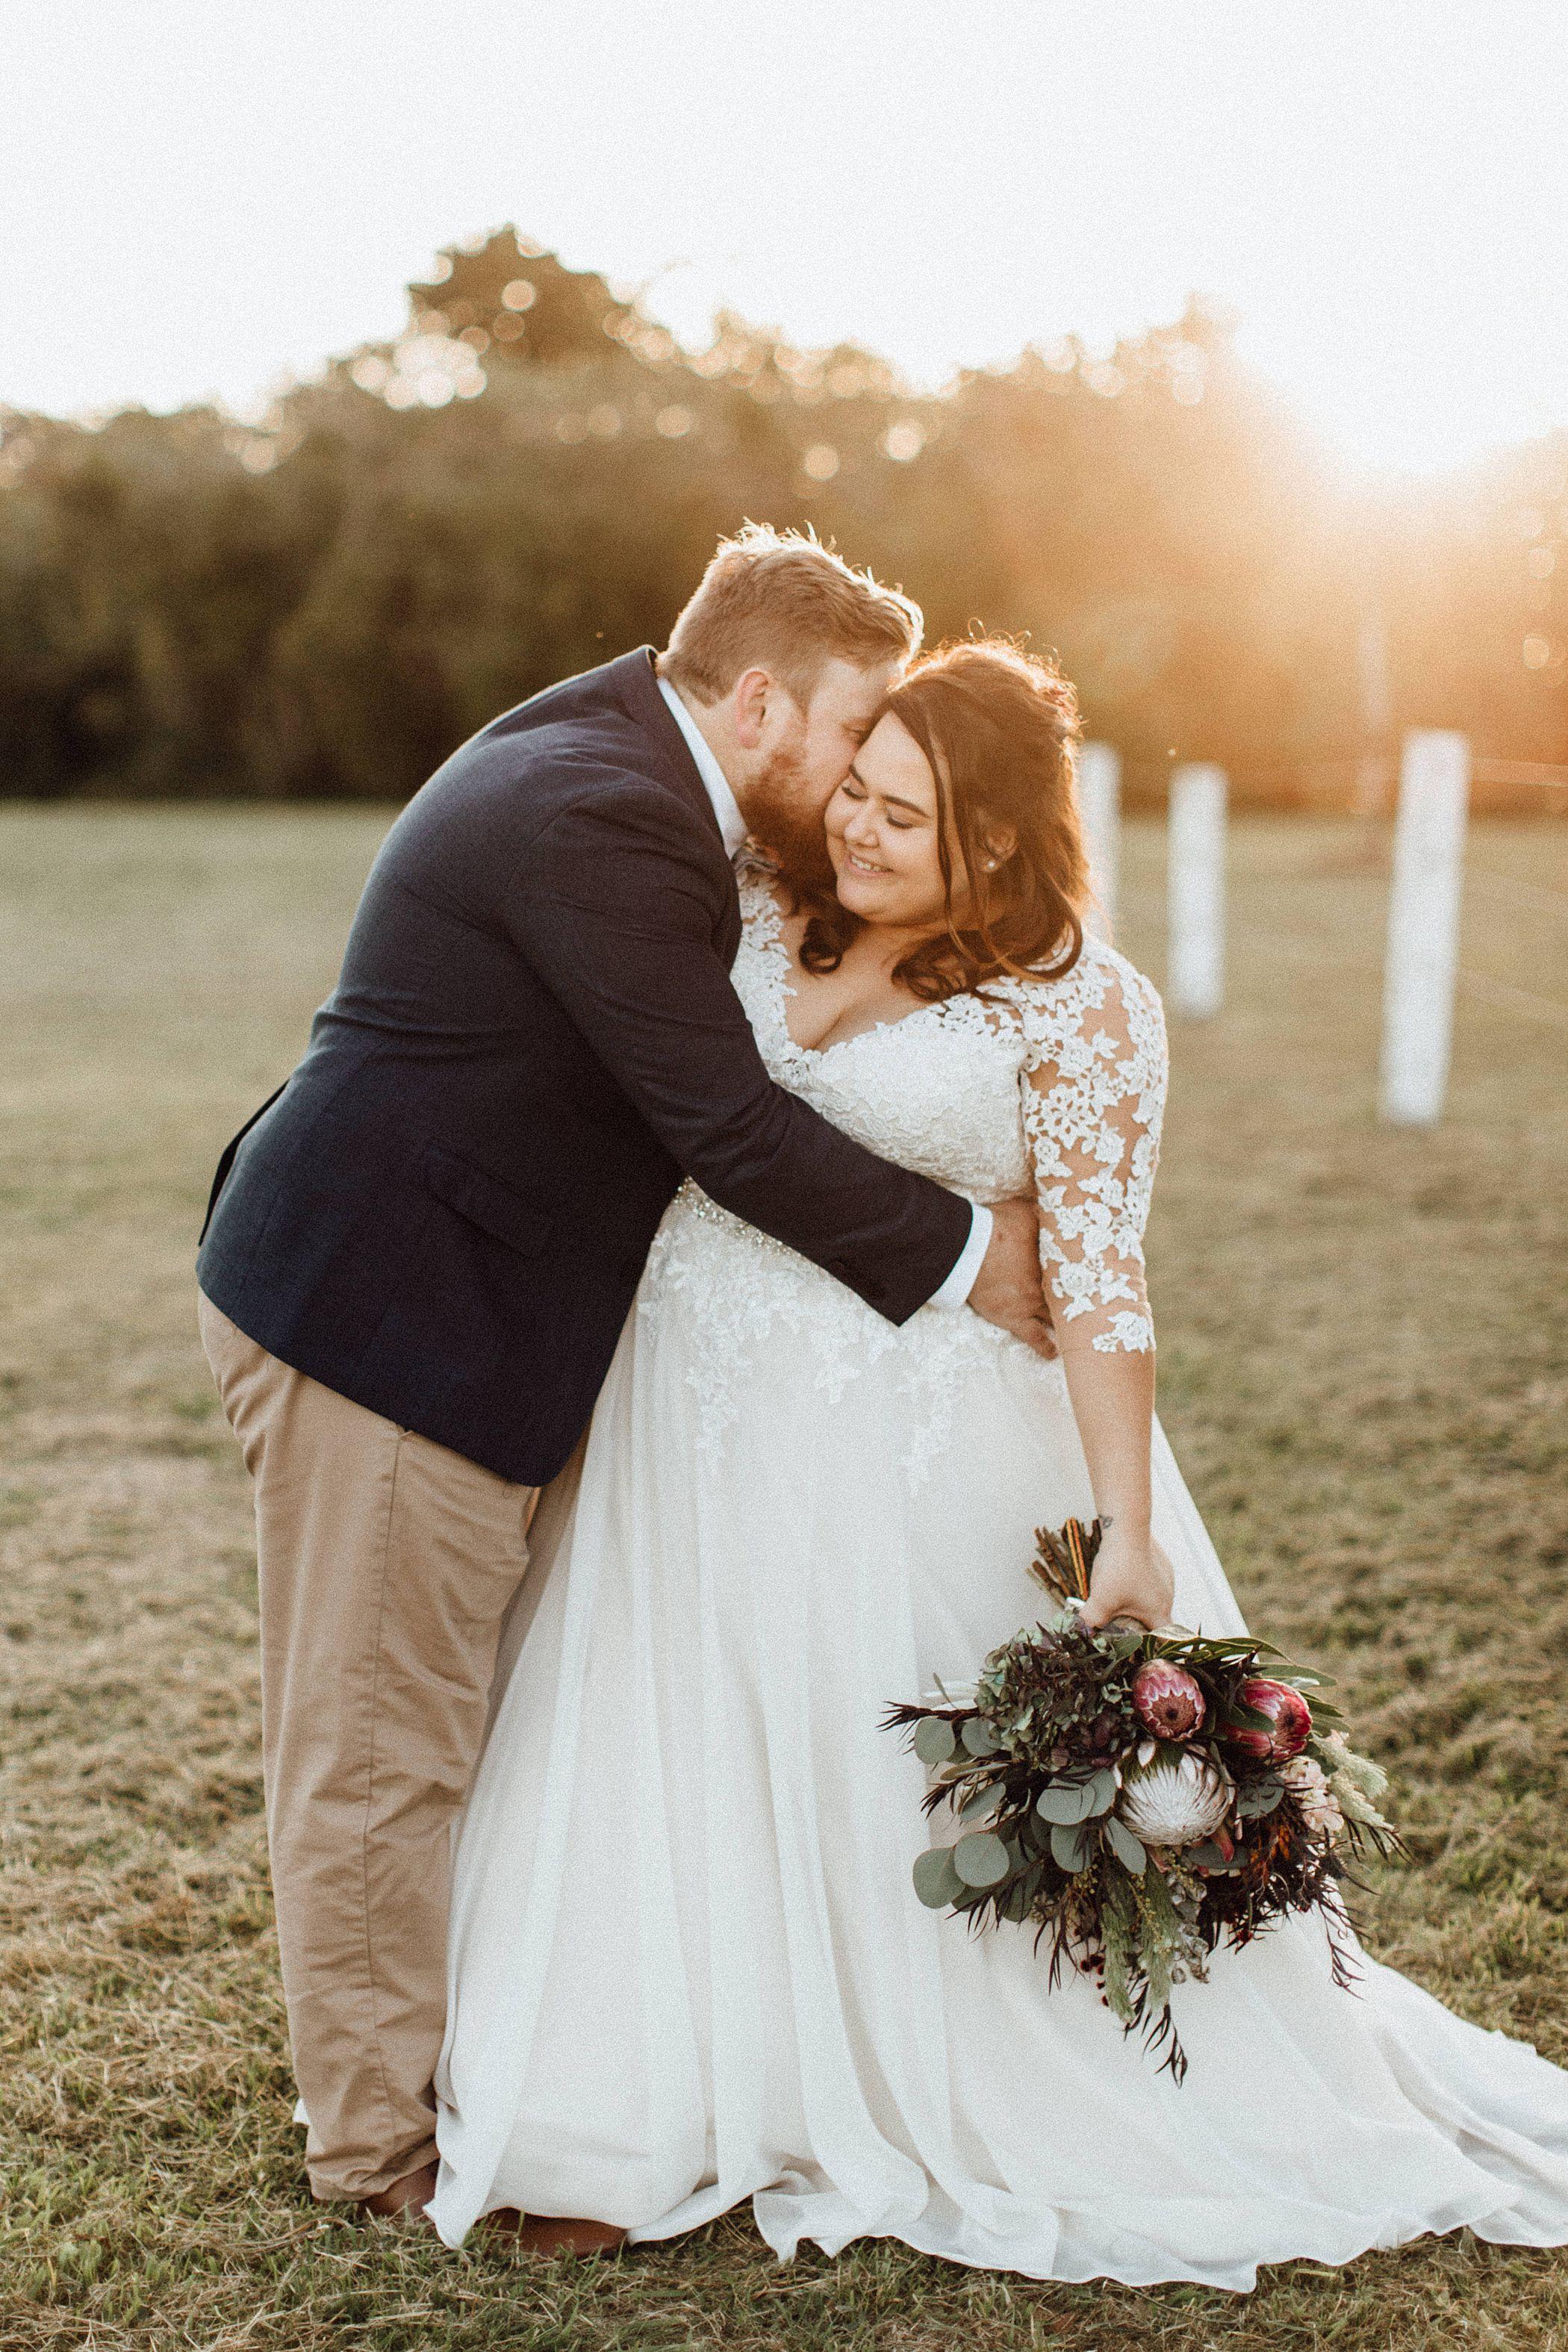 lauren-anne-photography-newcastle-hunter-valley-wedding-photographer_1212.jpg